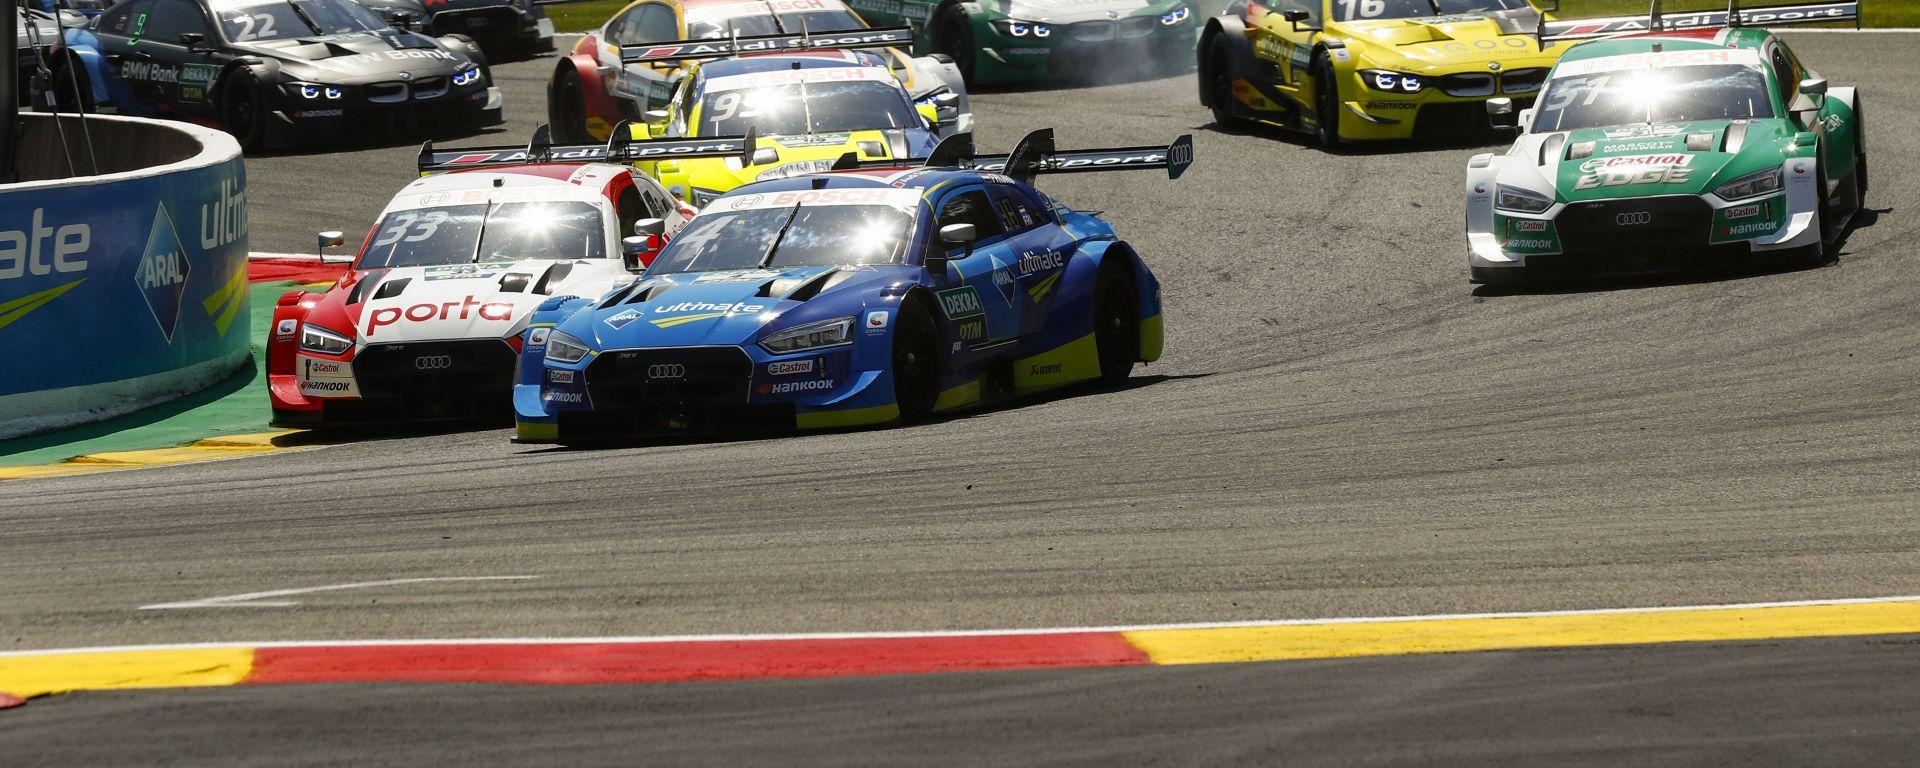 DTM, la partenza della gara 2020 a Spa-Francorchamps